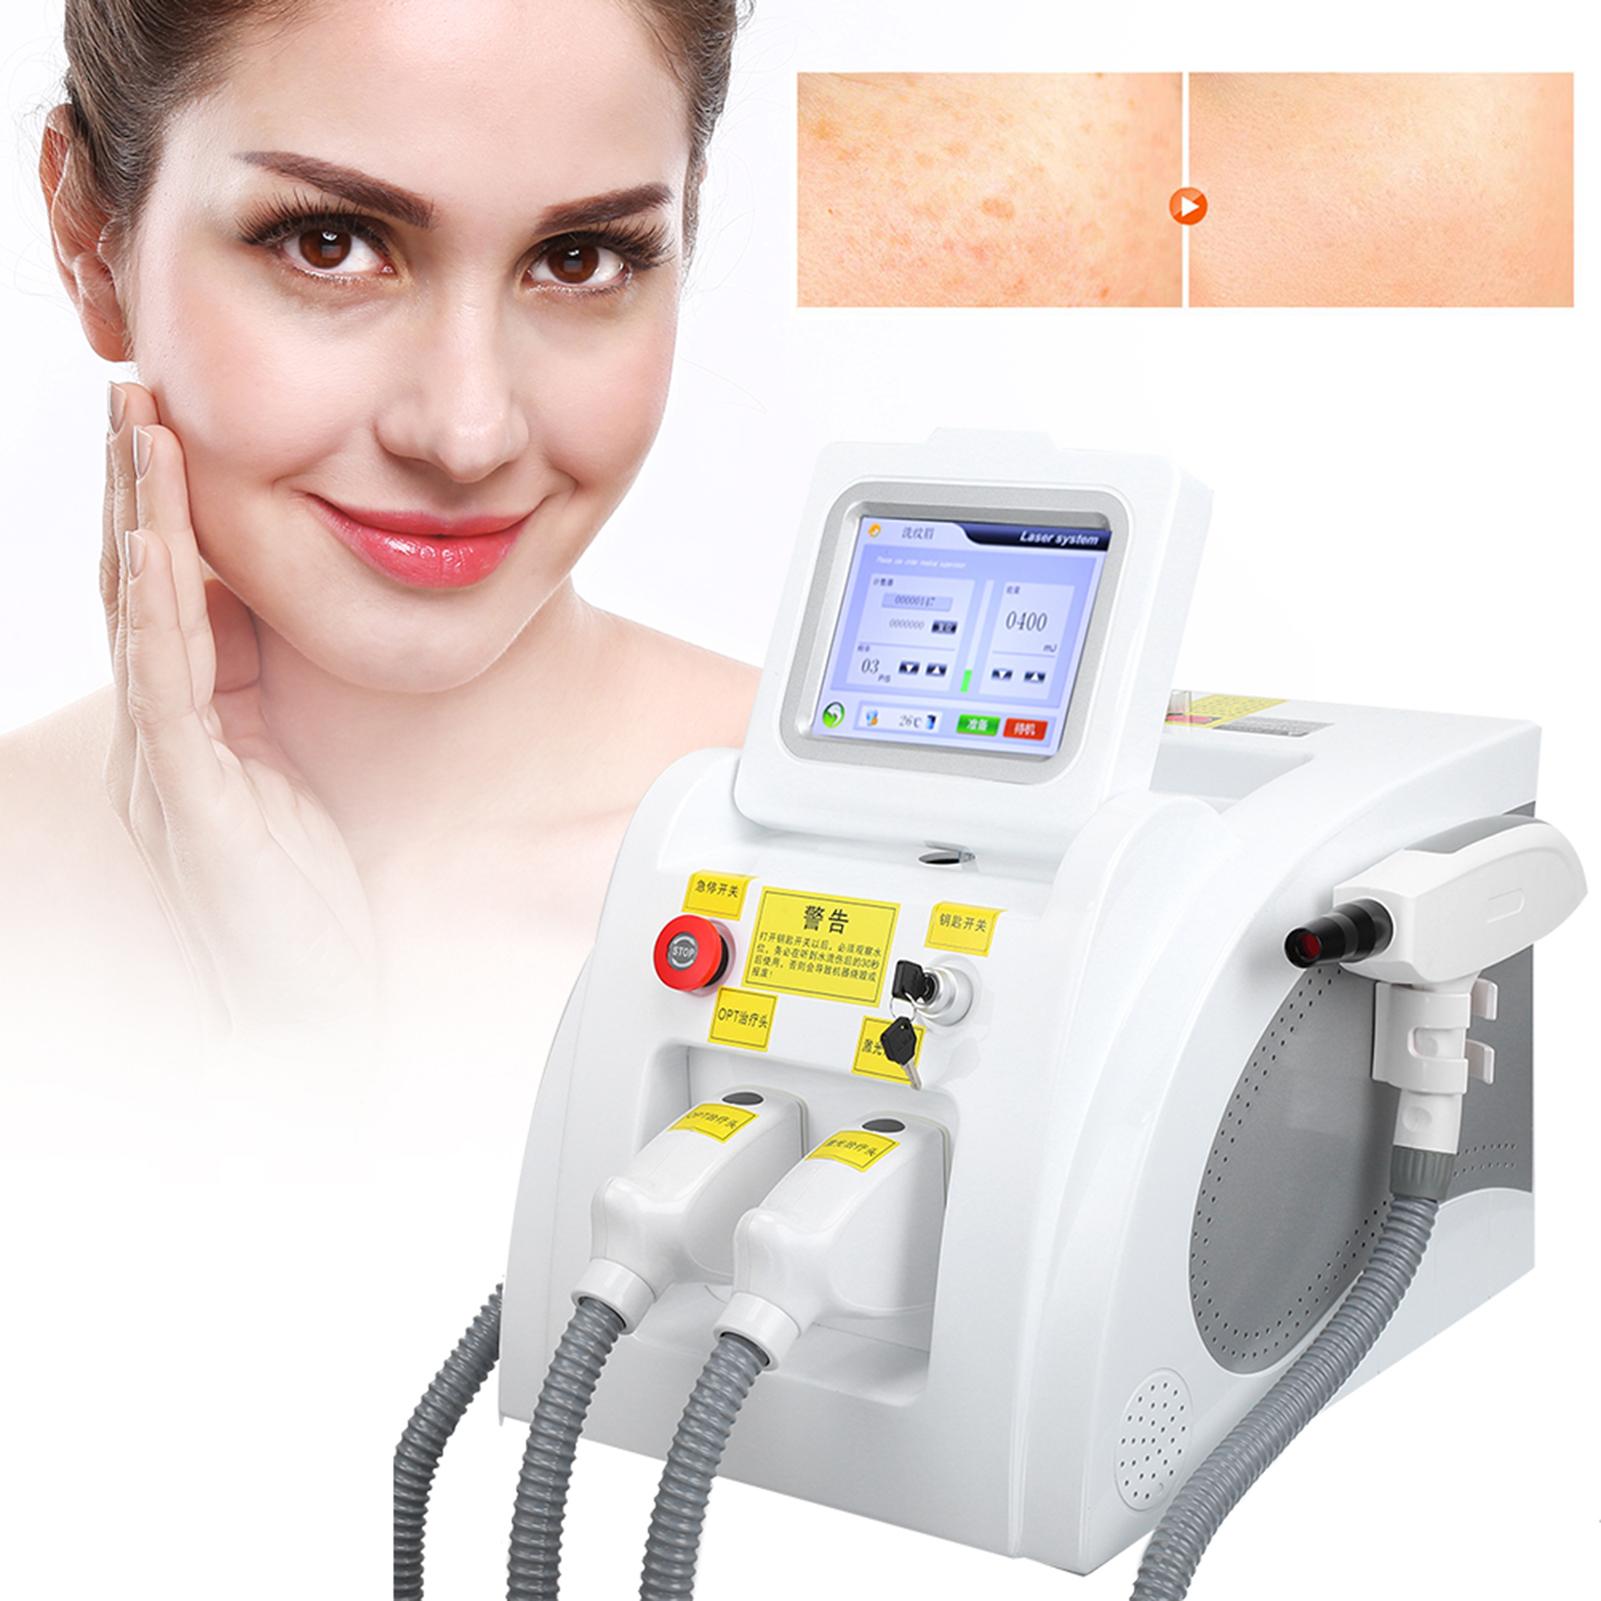 Indexbild 28 - 2In1 SHR OPT IPL Hair Removal RF Laser Skin Rejuvenation Tattoo Removal Machine